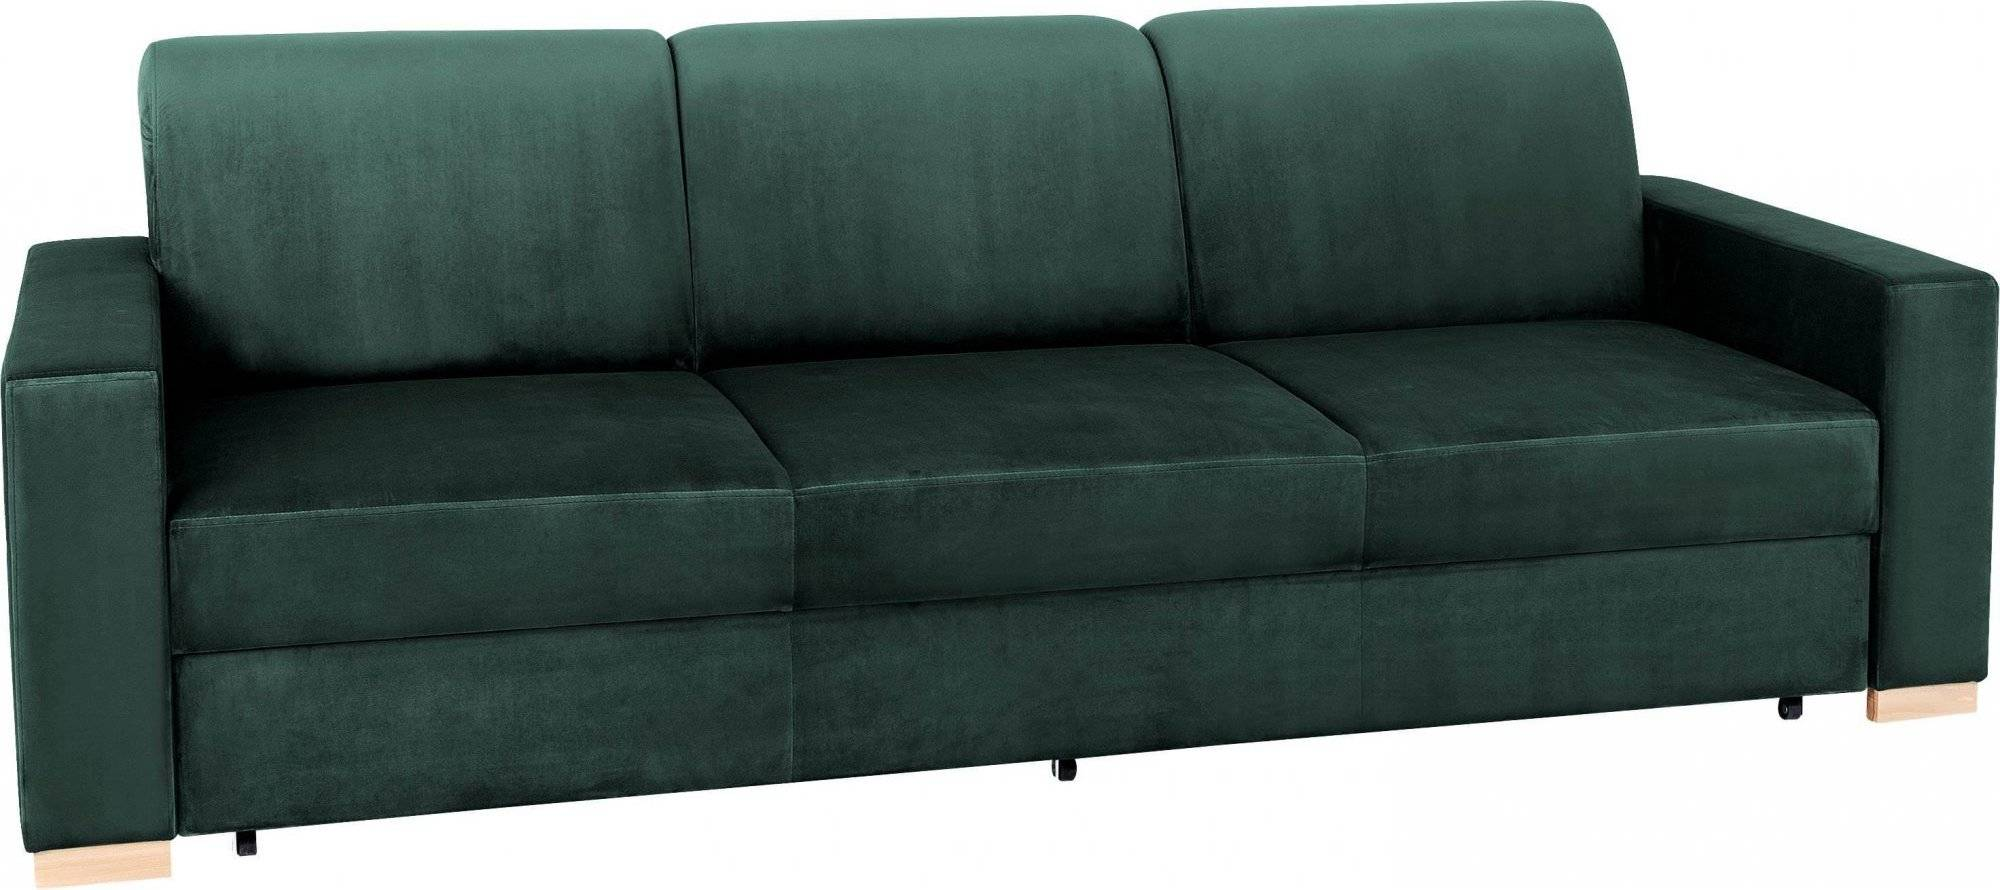 Custom Form Canapé convertible 3 places tissu vert avocat h40cm